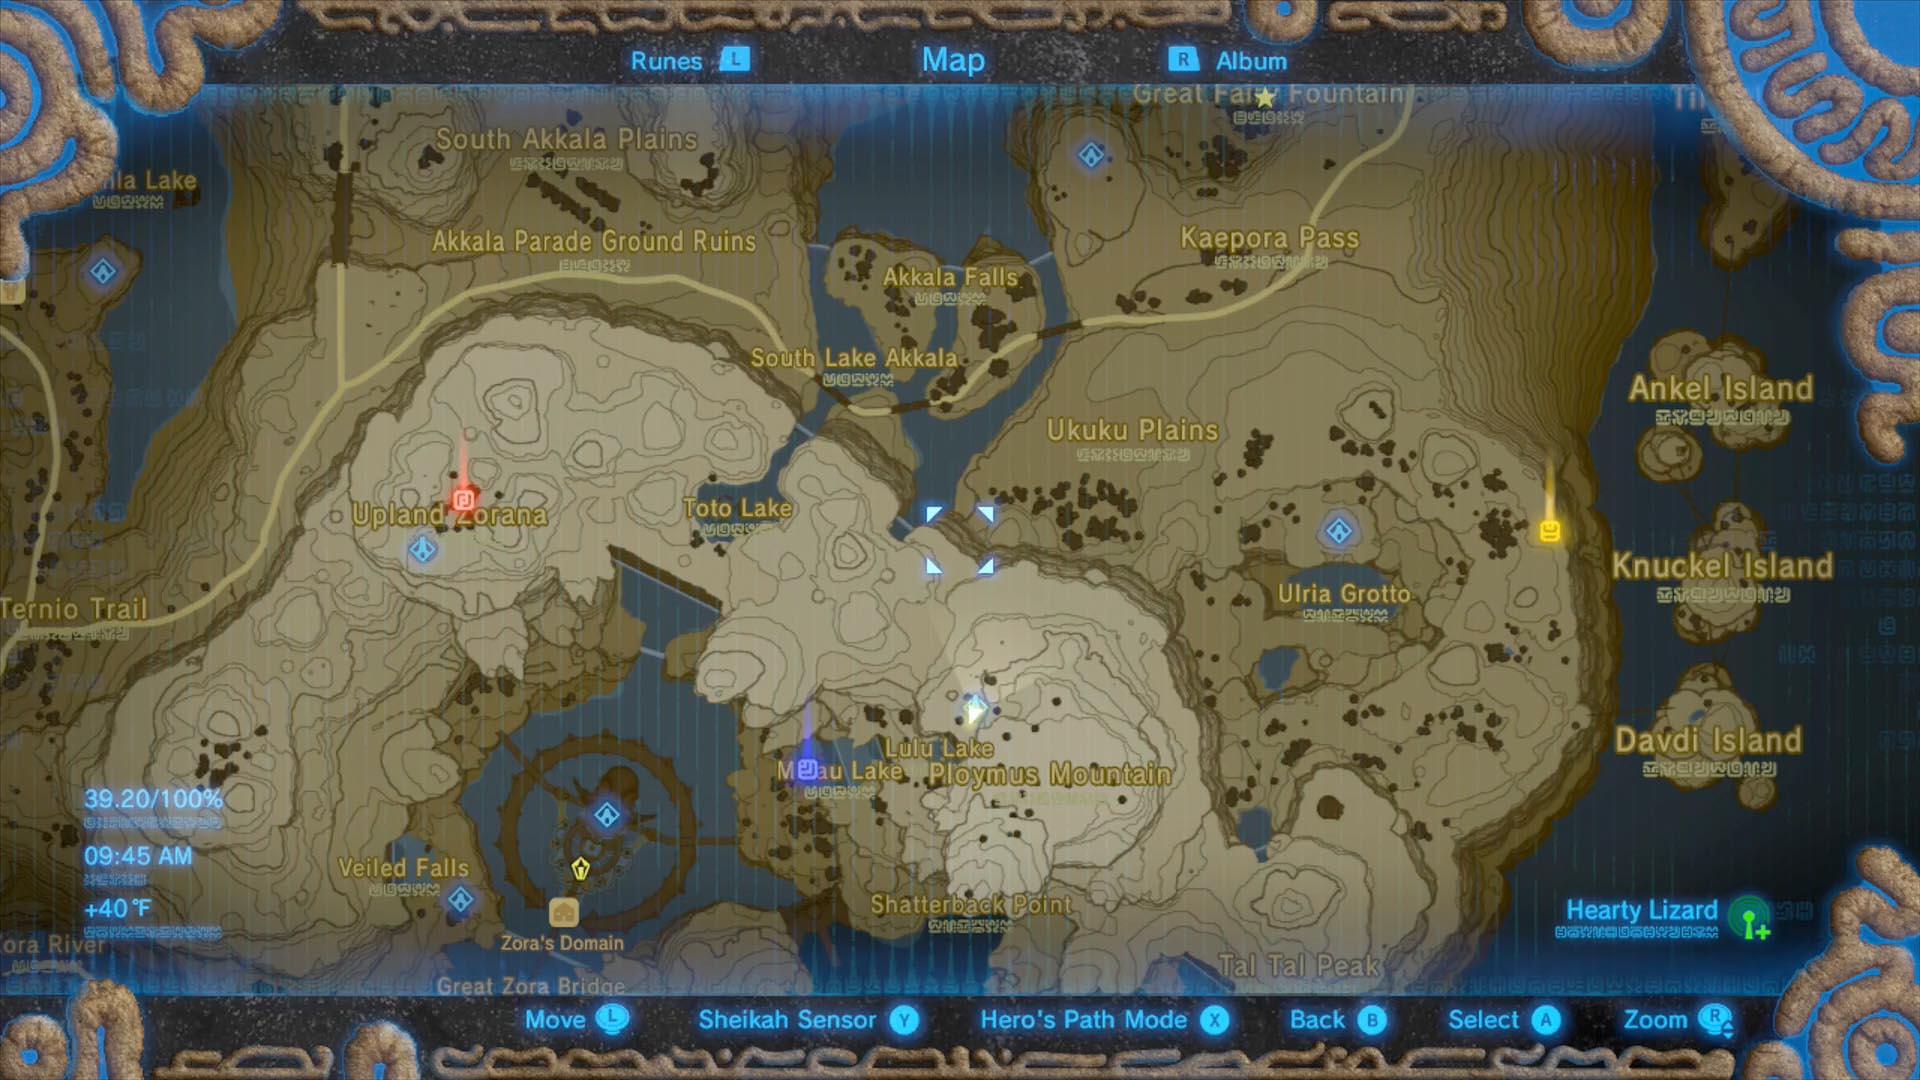 Zelda Botw Shrine Map >> Zelda Breath of the Wild Champions' Ballad guide: Sato Koda shrine walkthrough and puzzle ...